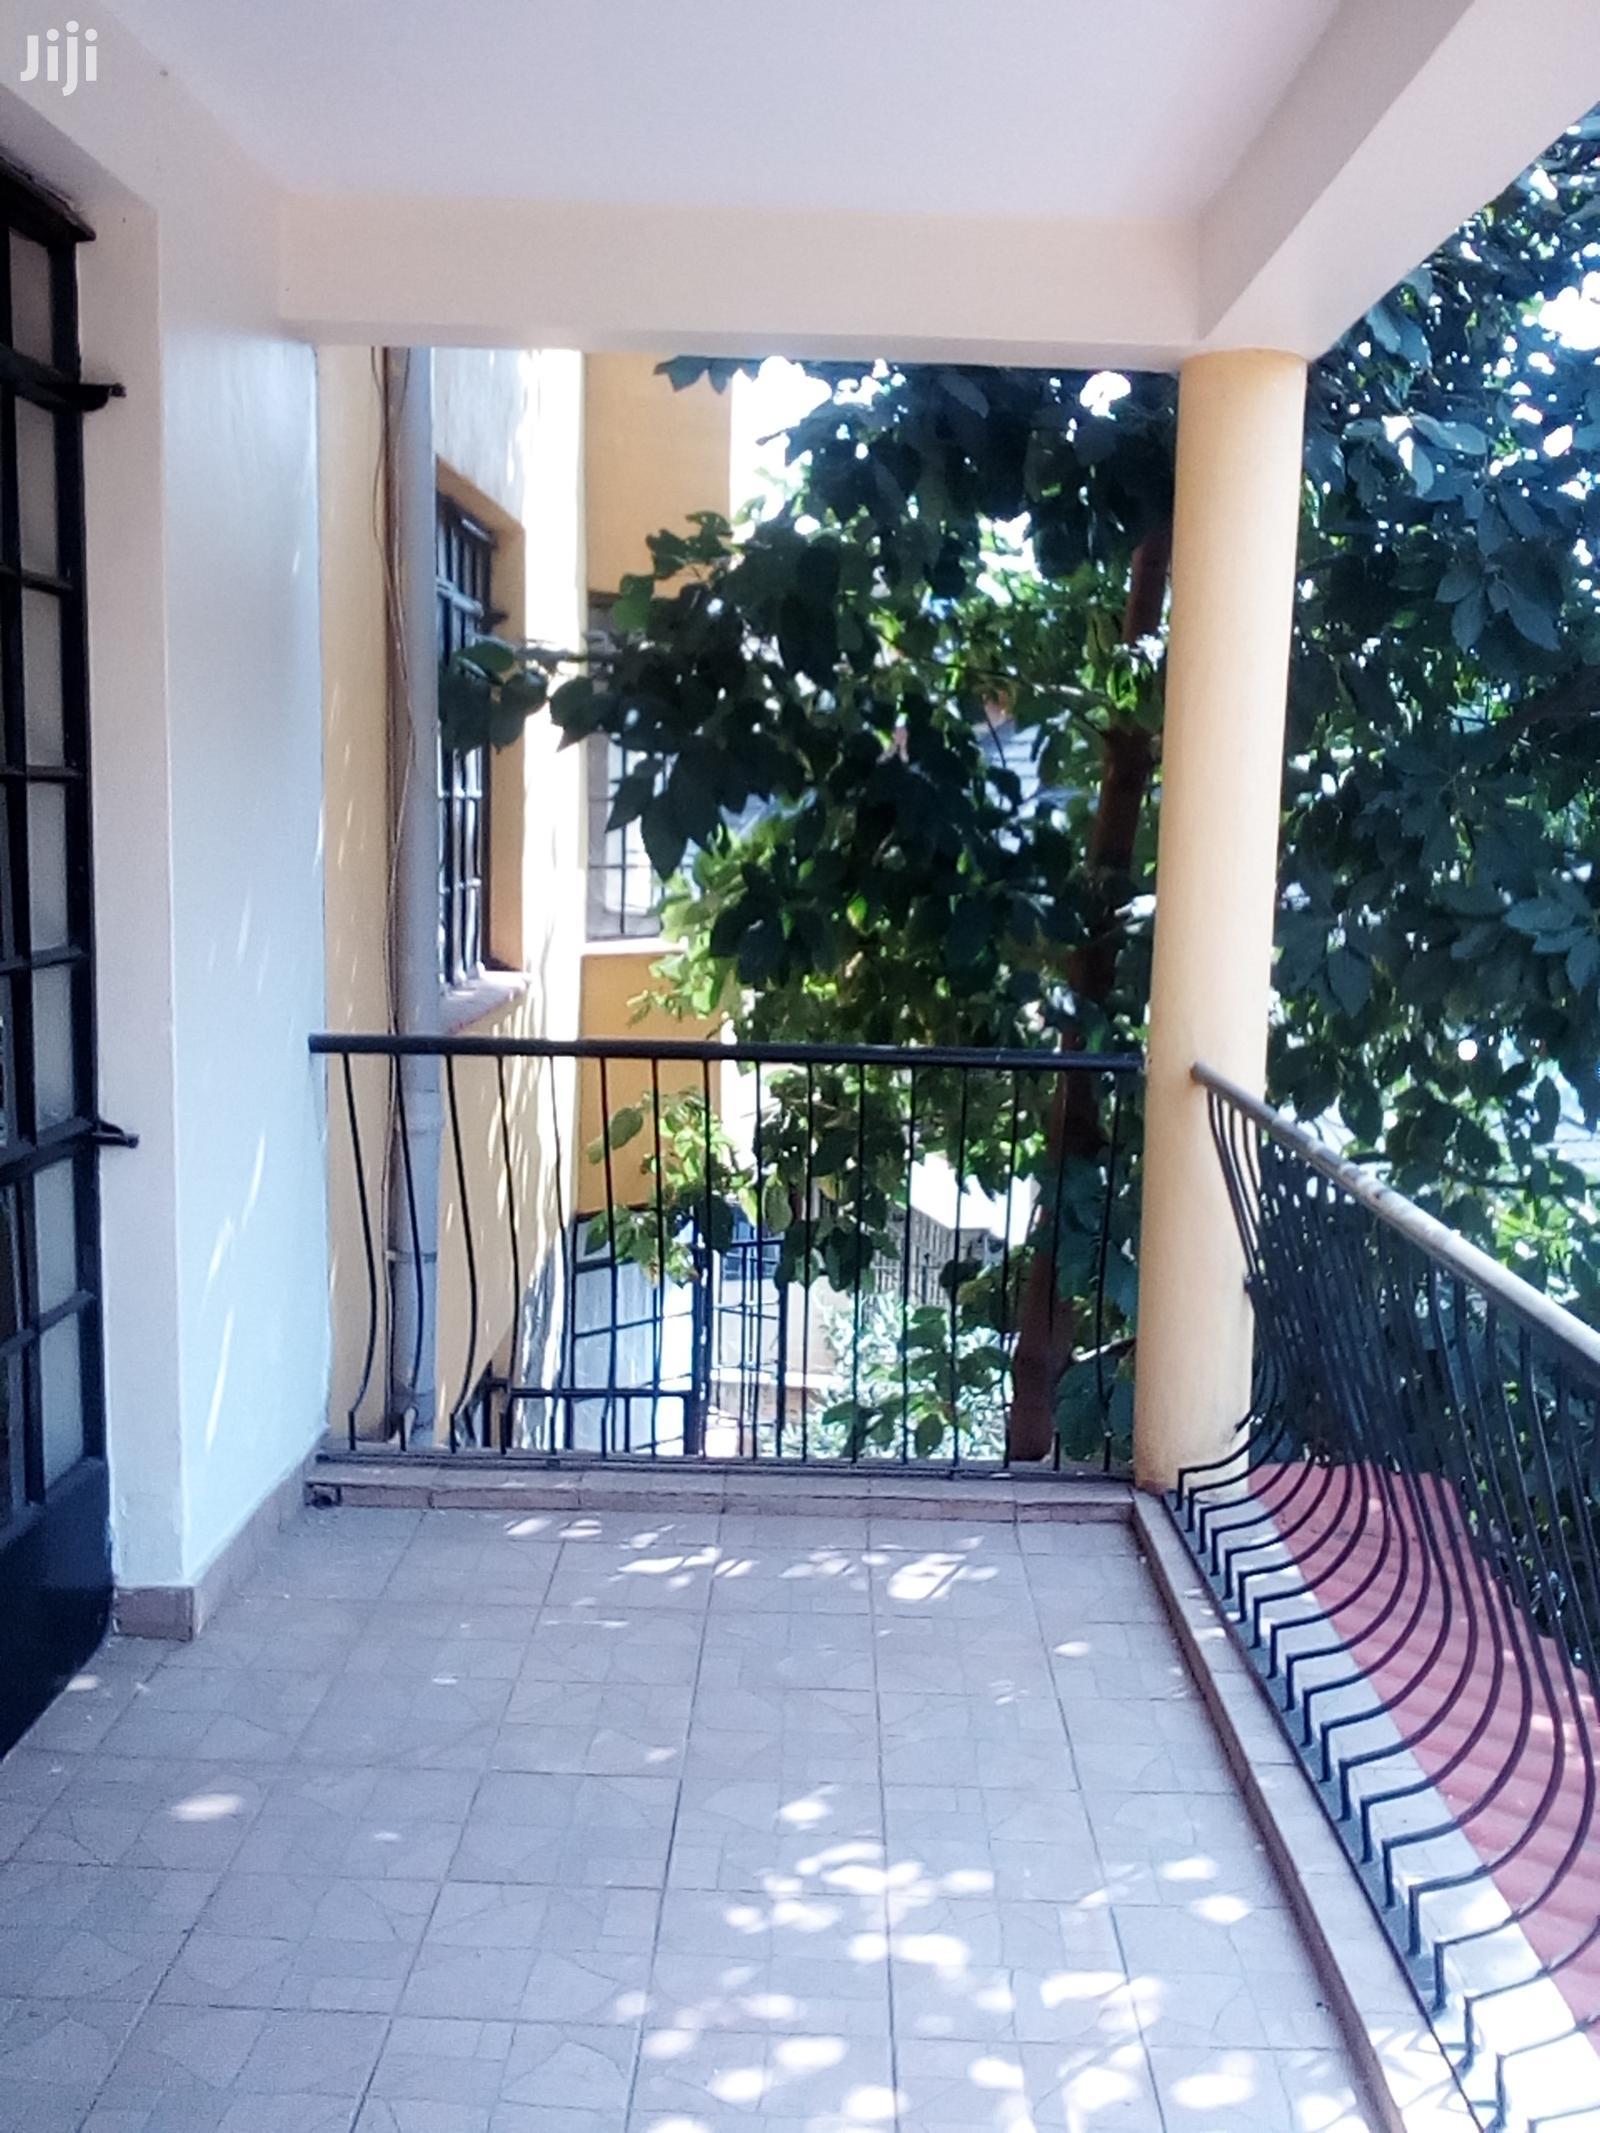 Kileleshwa Spacious Three Bedroom Apartment to Let. | Houses & Apartments For Rent for sale in Kileleshwa, Nairobi, Kenya